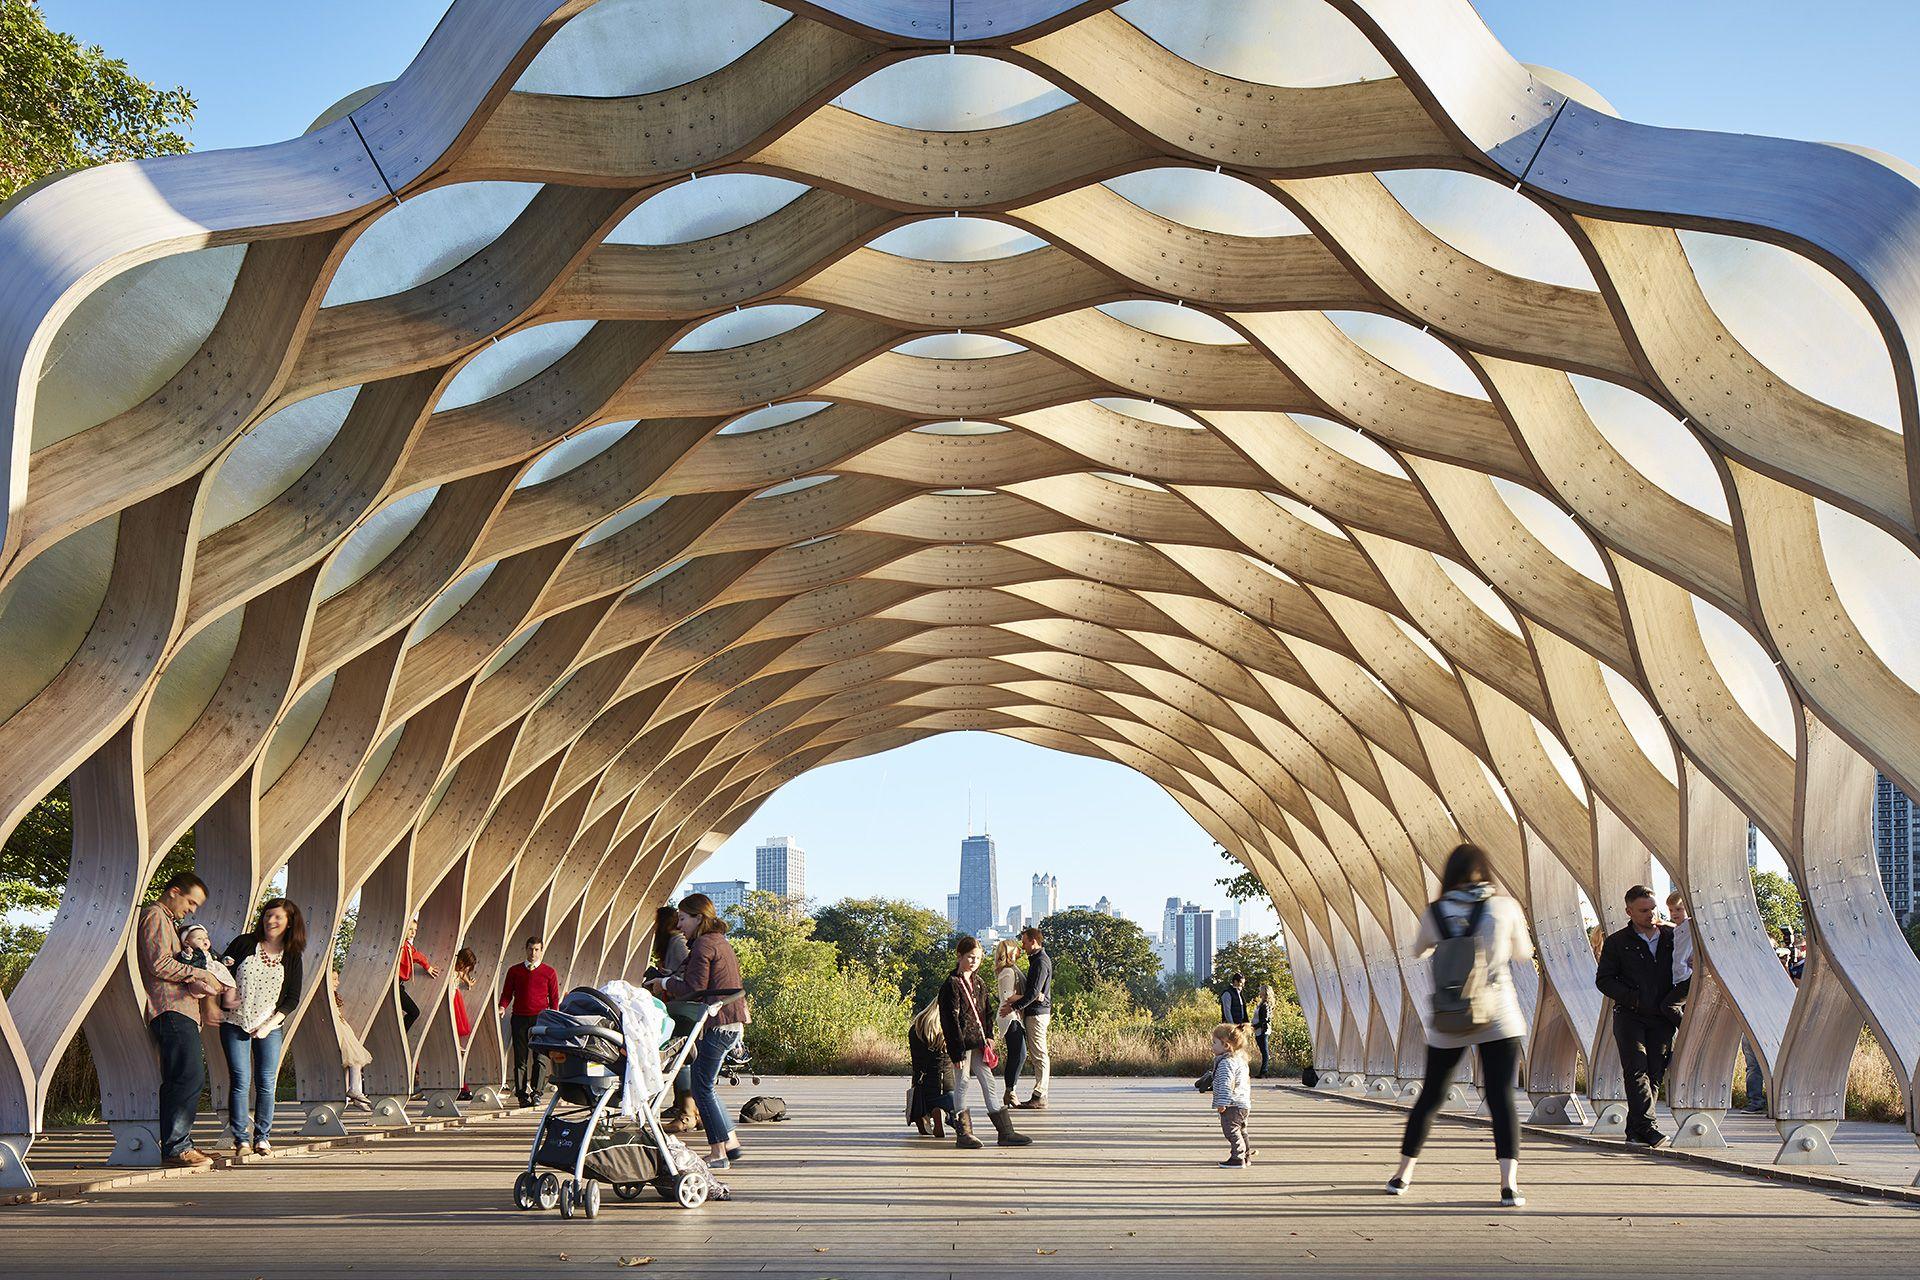 Glulam And Fibreglass Pavilion At Chicago S Lincoln Park